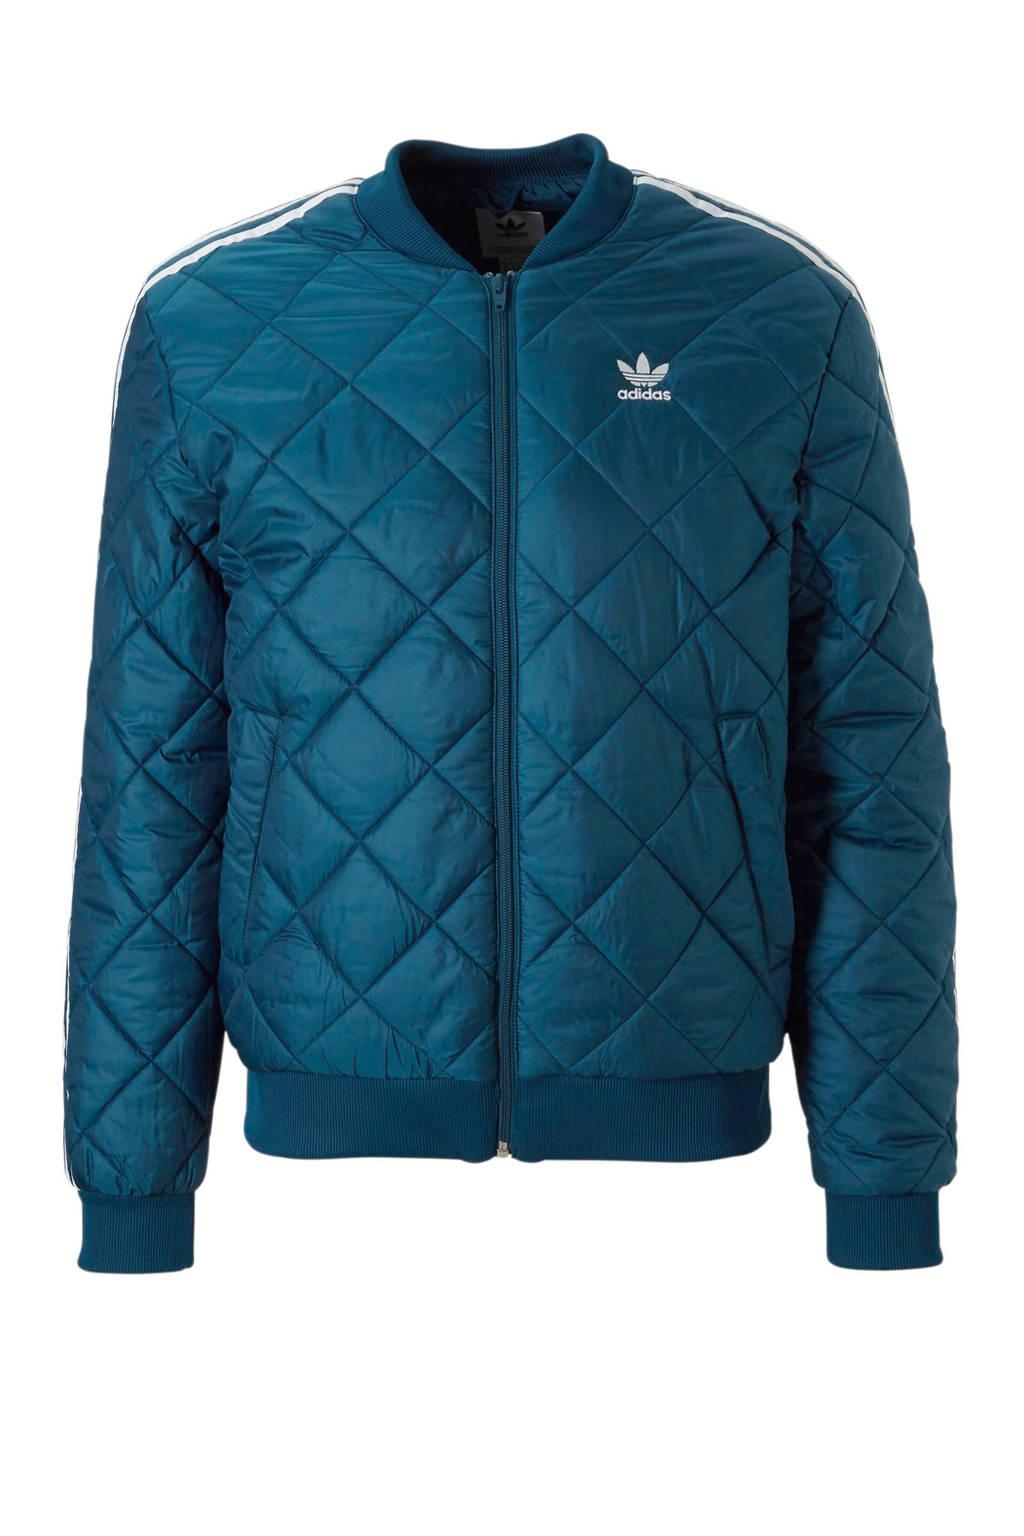 adidas originals   jas, Blauw